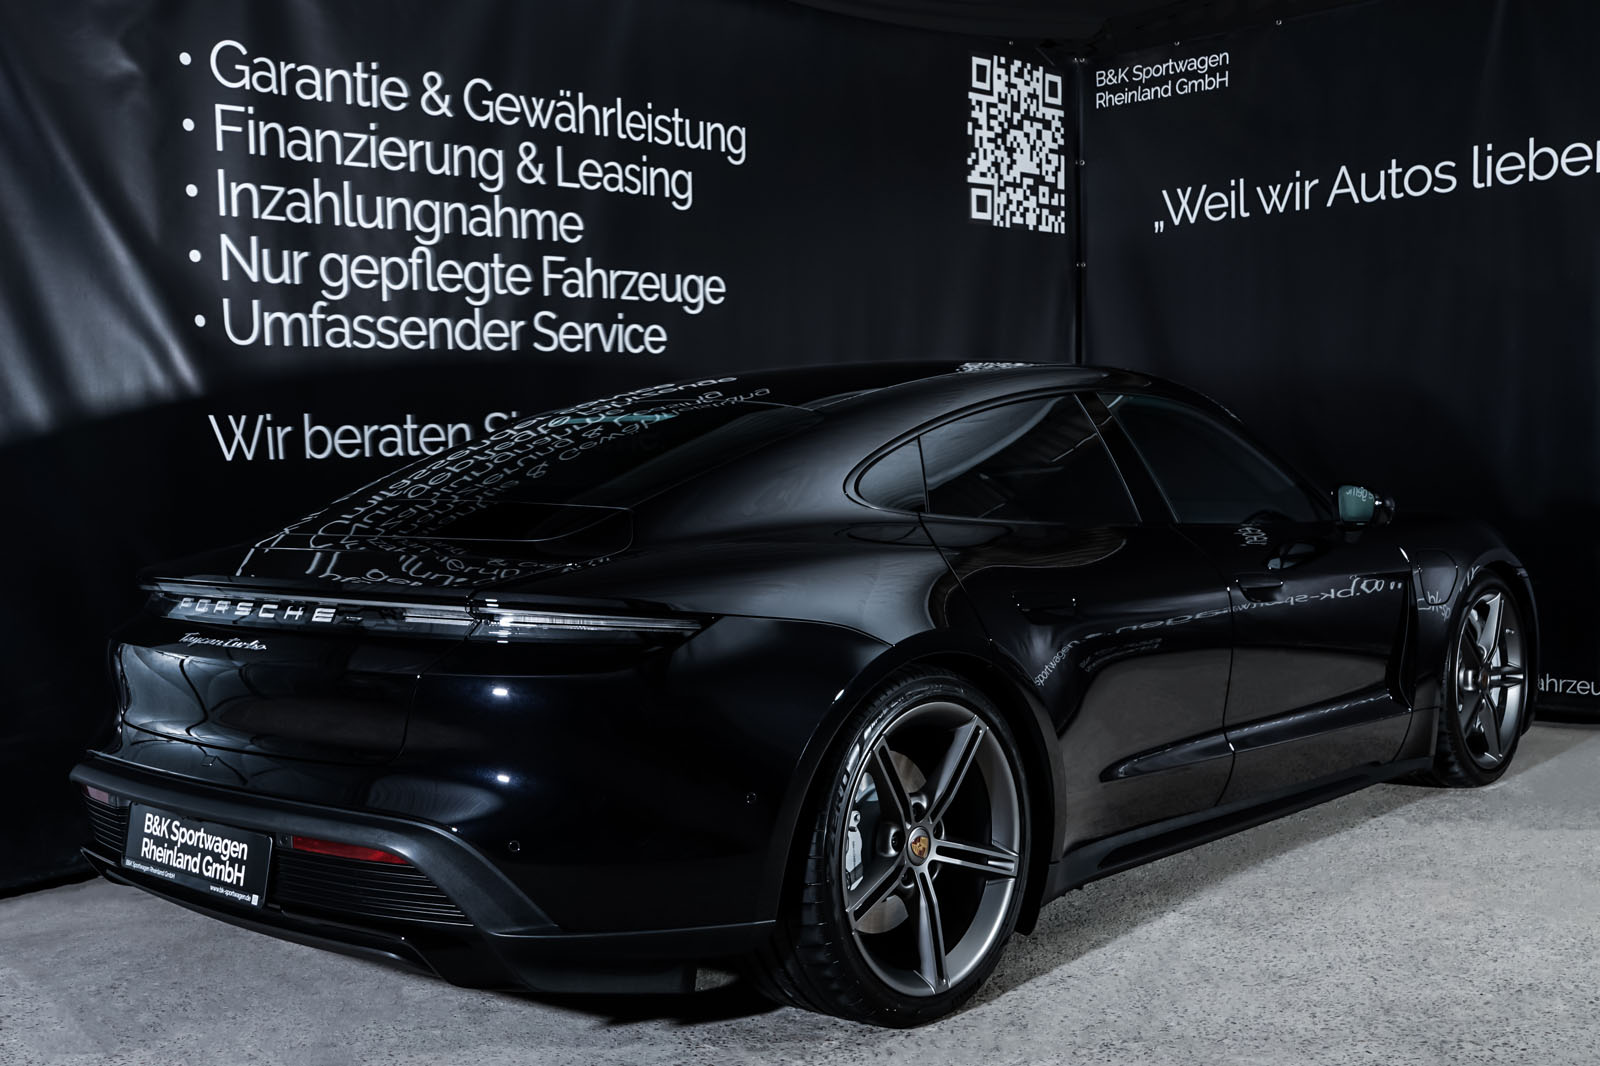 Porsche_Taycan_Turbo_Schwarz_Schwarz_POR-8106_16_w